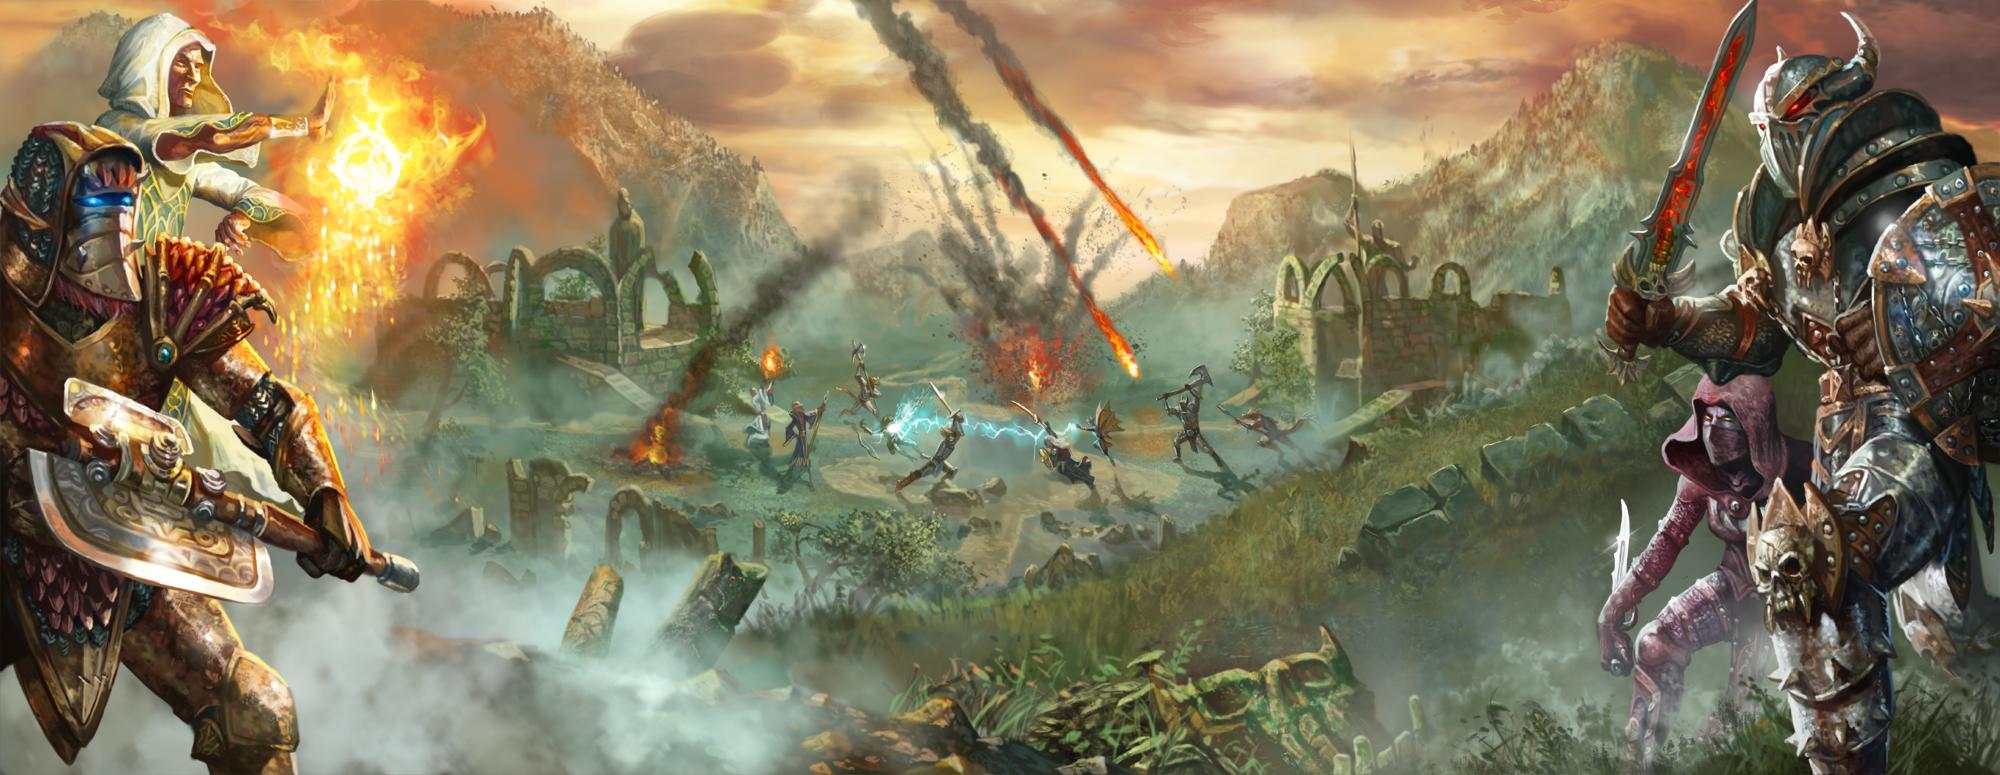 EverQuest II - News - Kander's Candor: Return of Nagafen